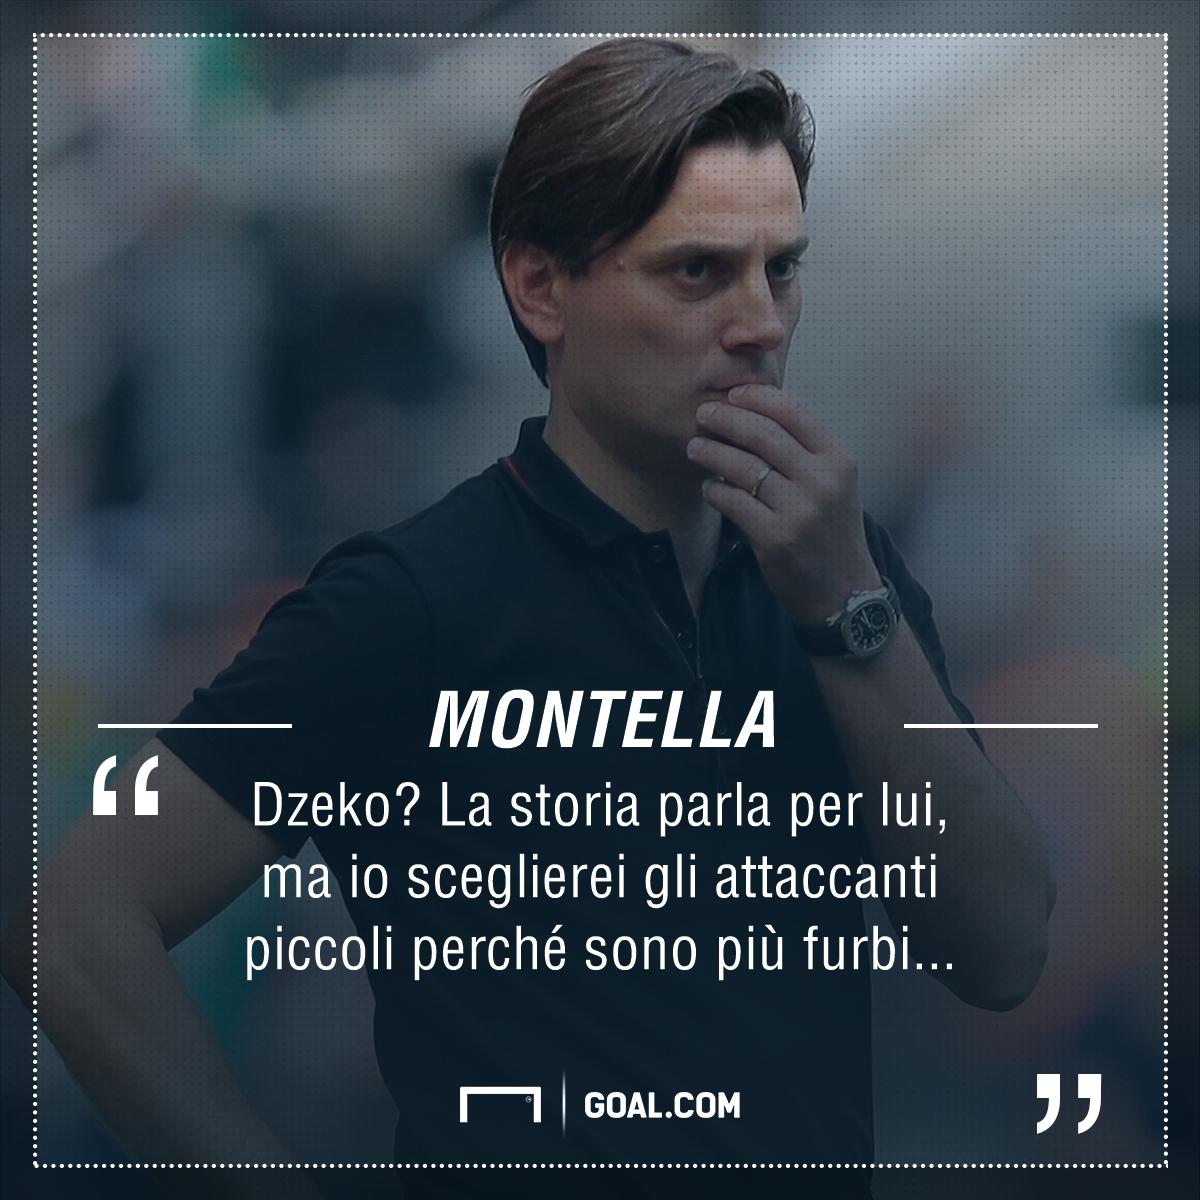 PS Montella Dzeko